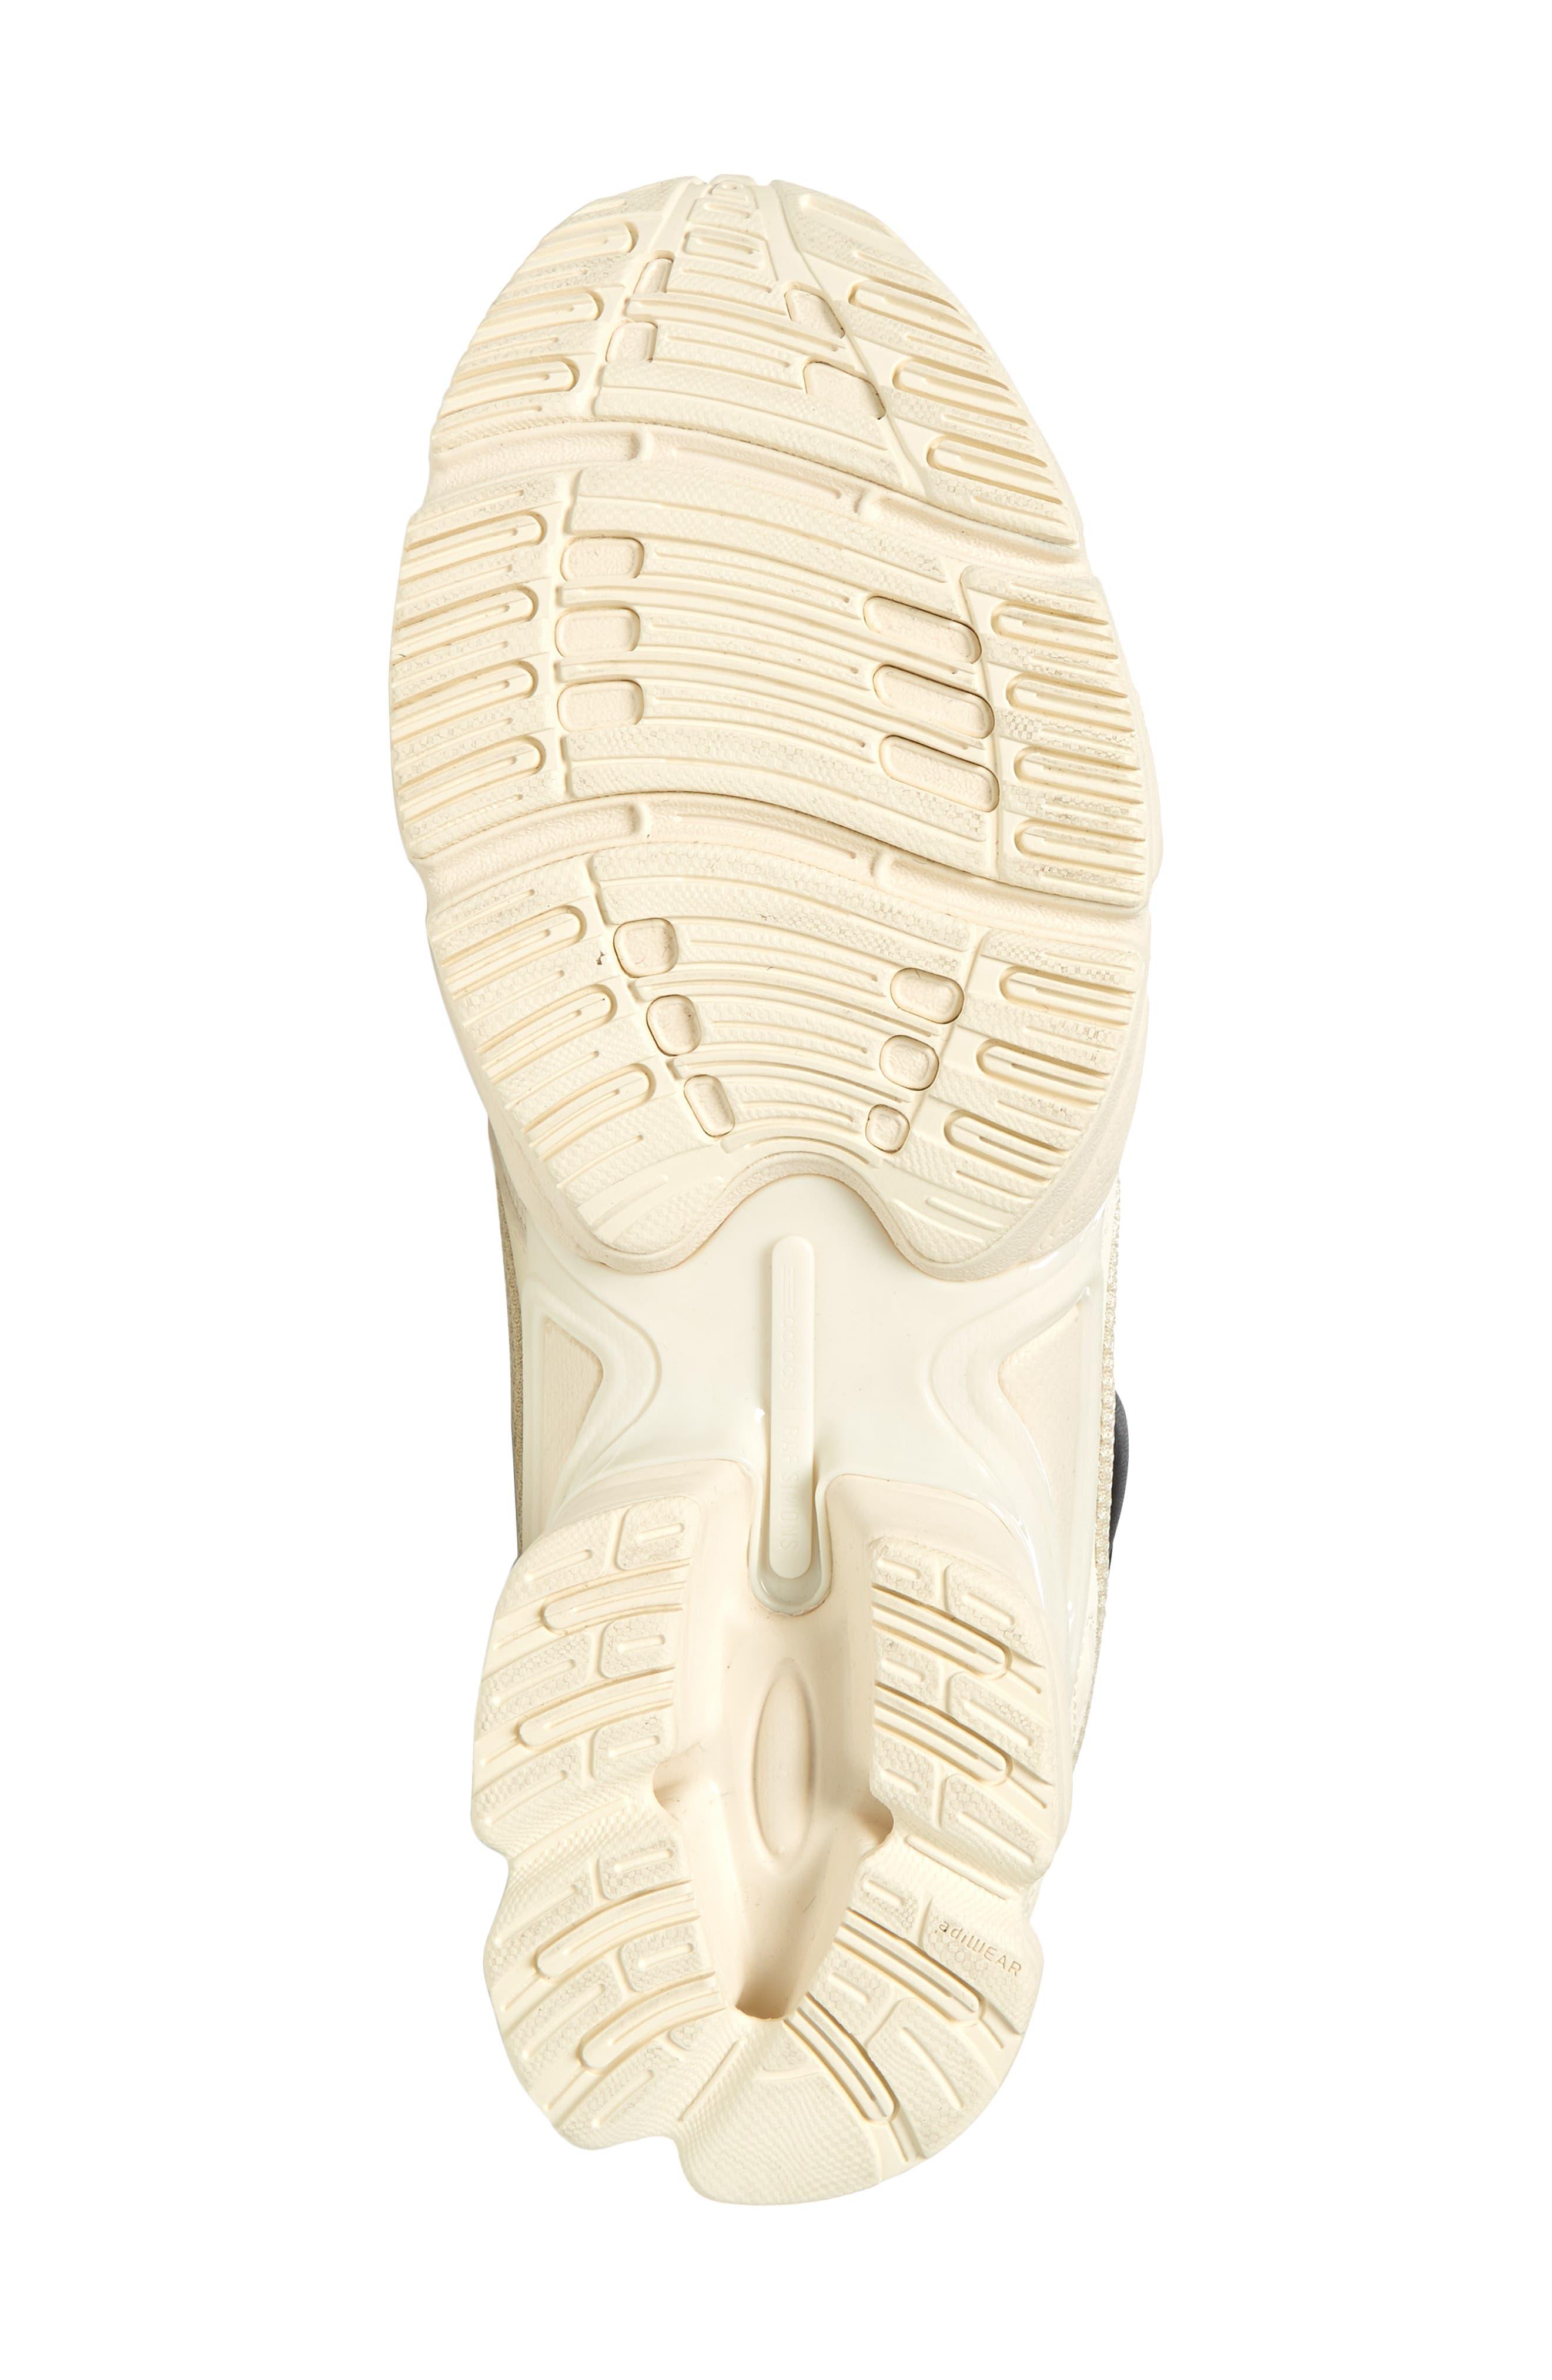 adidas by Raf Simons Ozweego III Sneaker,                             Alternate thumbnail 6, color,                             CREAM WHITE/ CORE BLACK